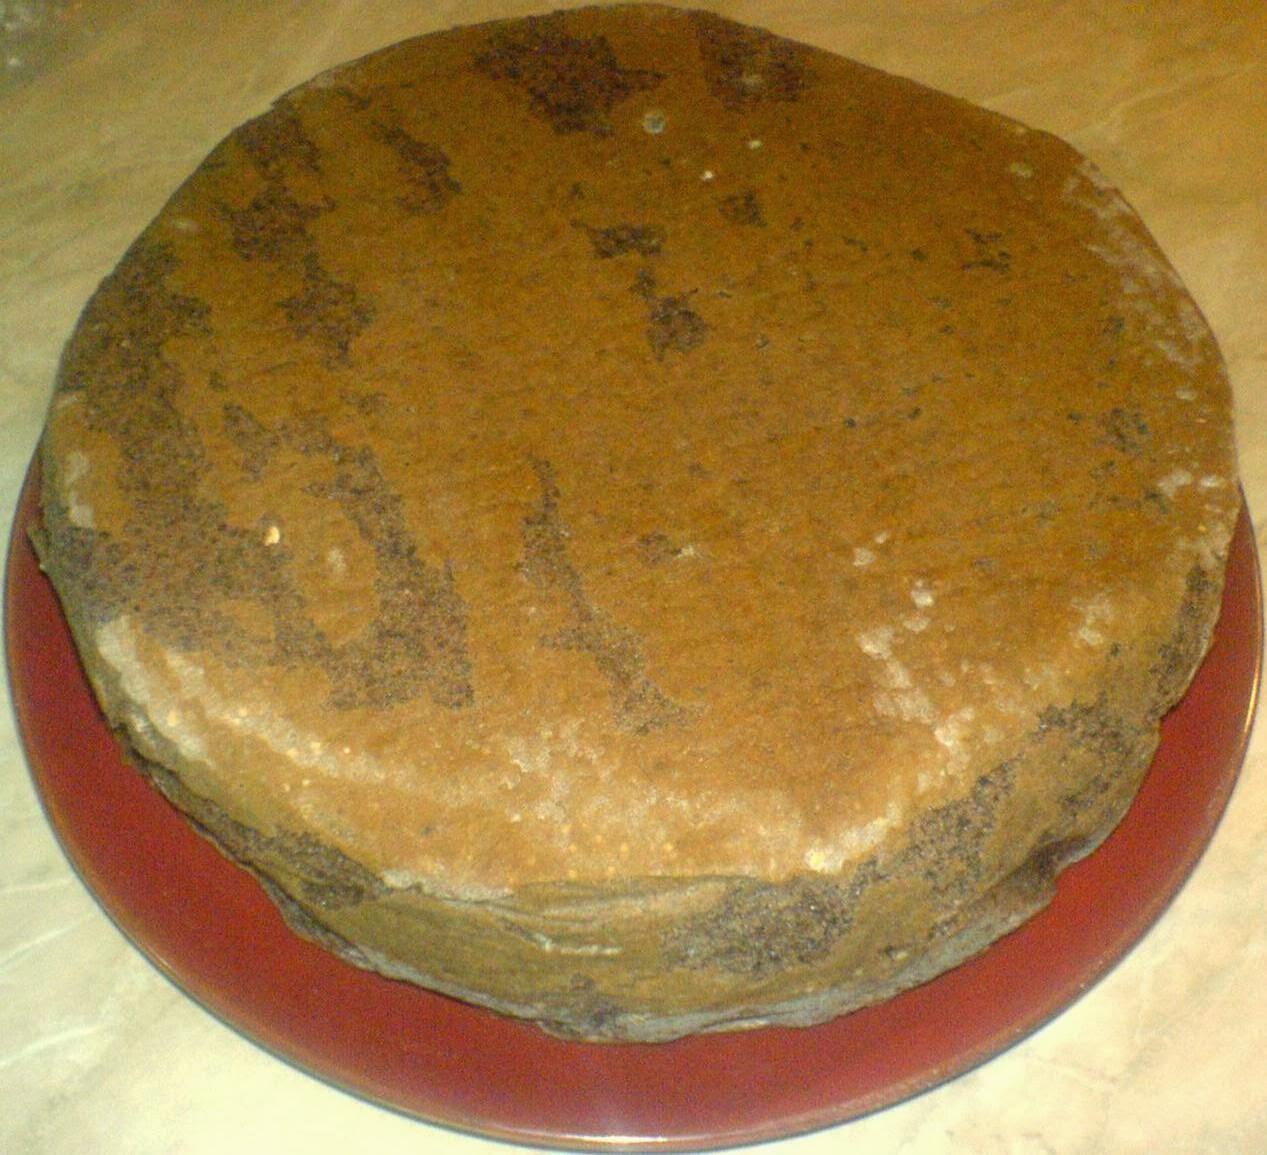 blat de tort, dulciuri, prajituri, torturi, retete de prajituri, retete de torturi, blat de tort de cacao, reteta blat de tort, blat tort, retete culinare